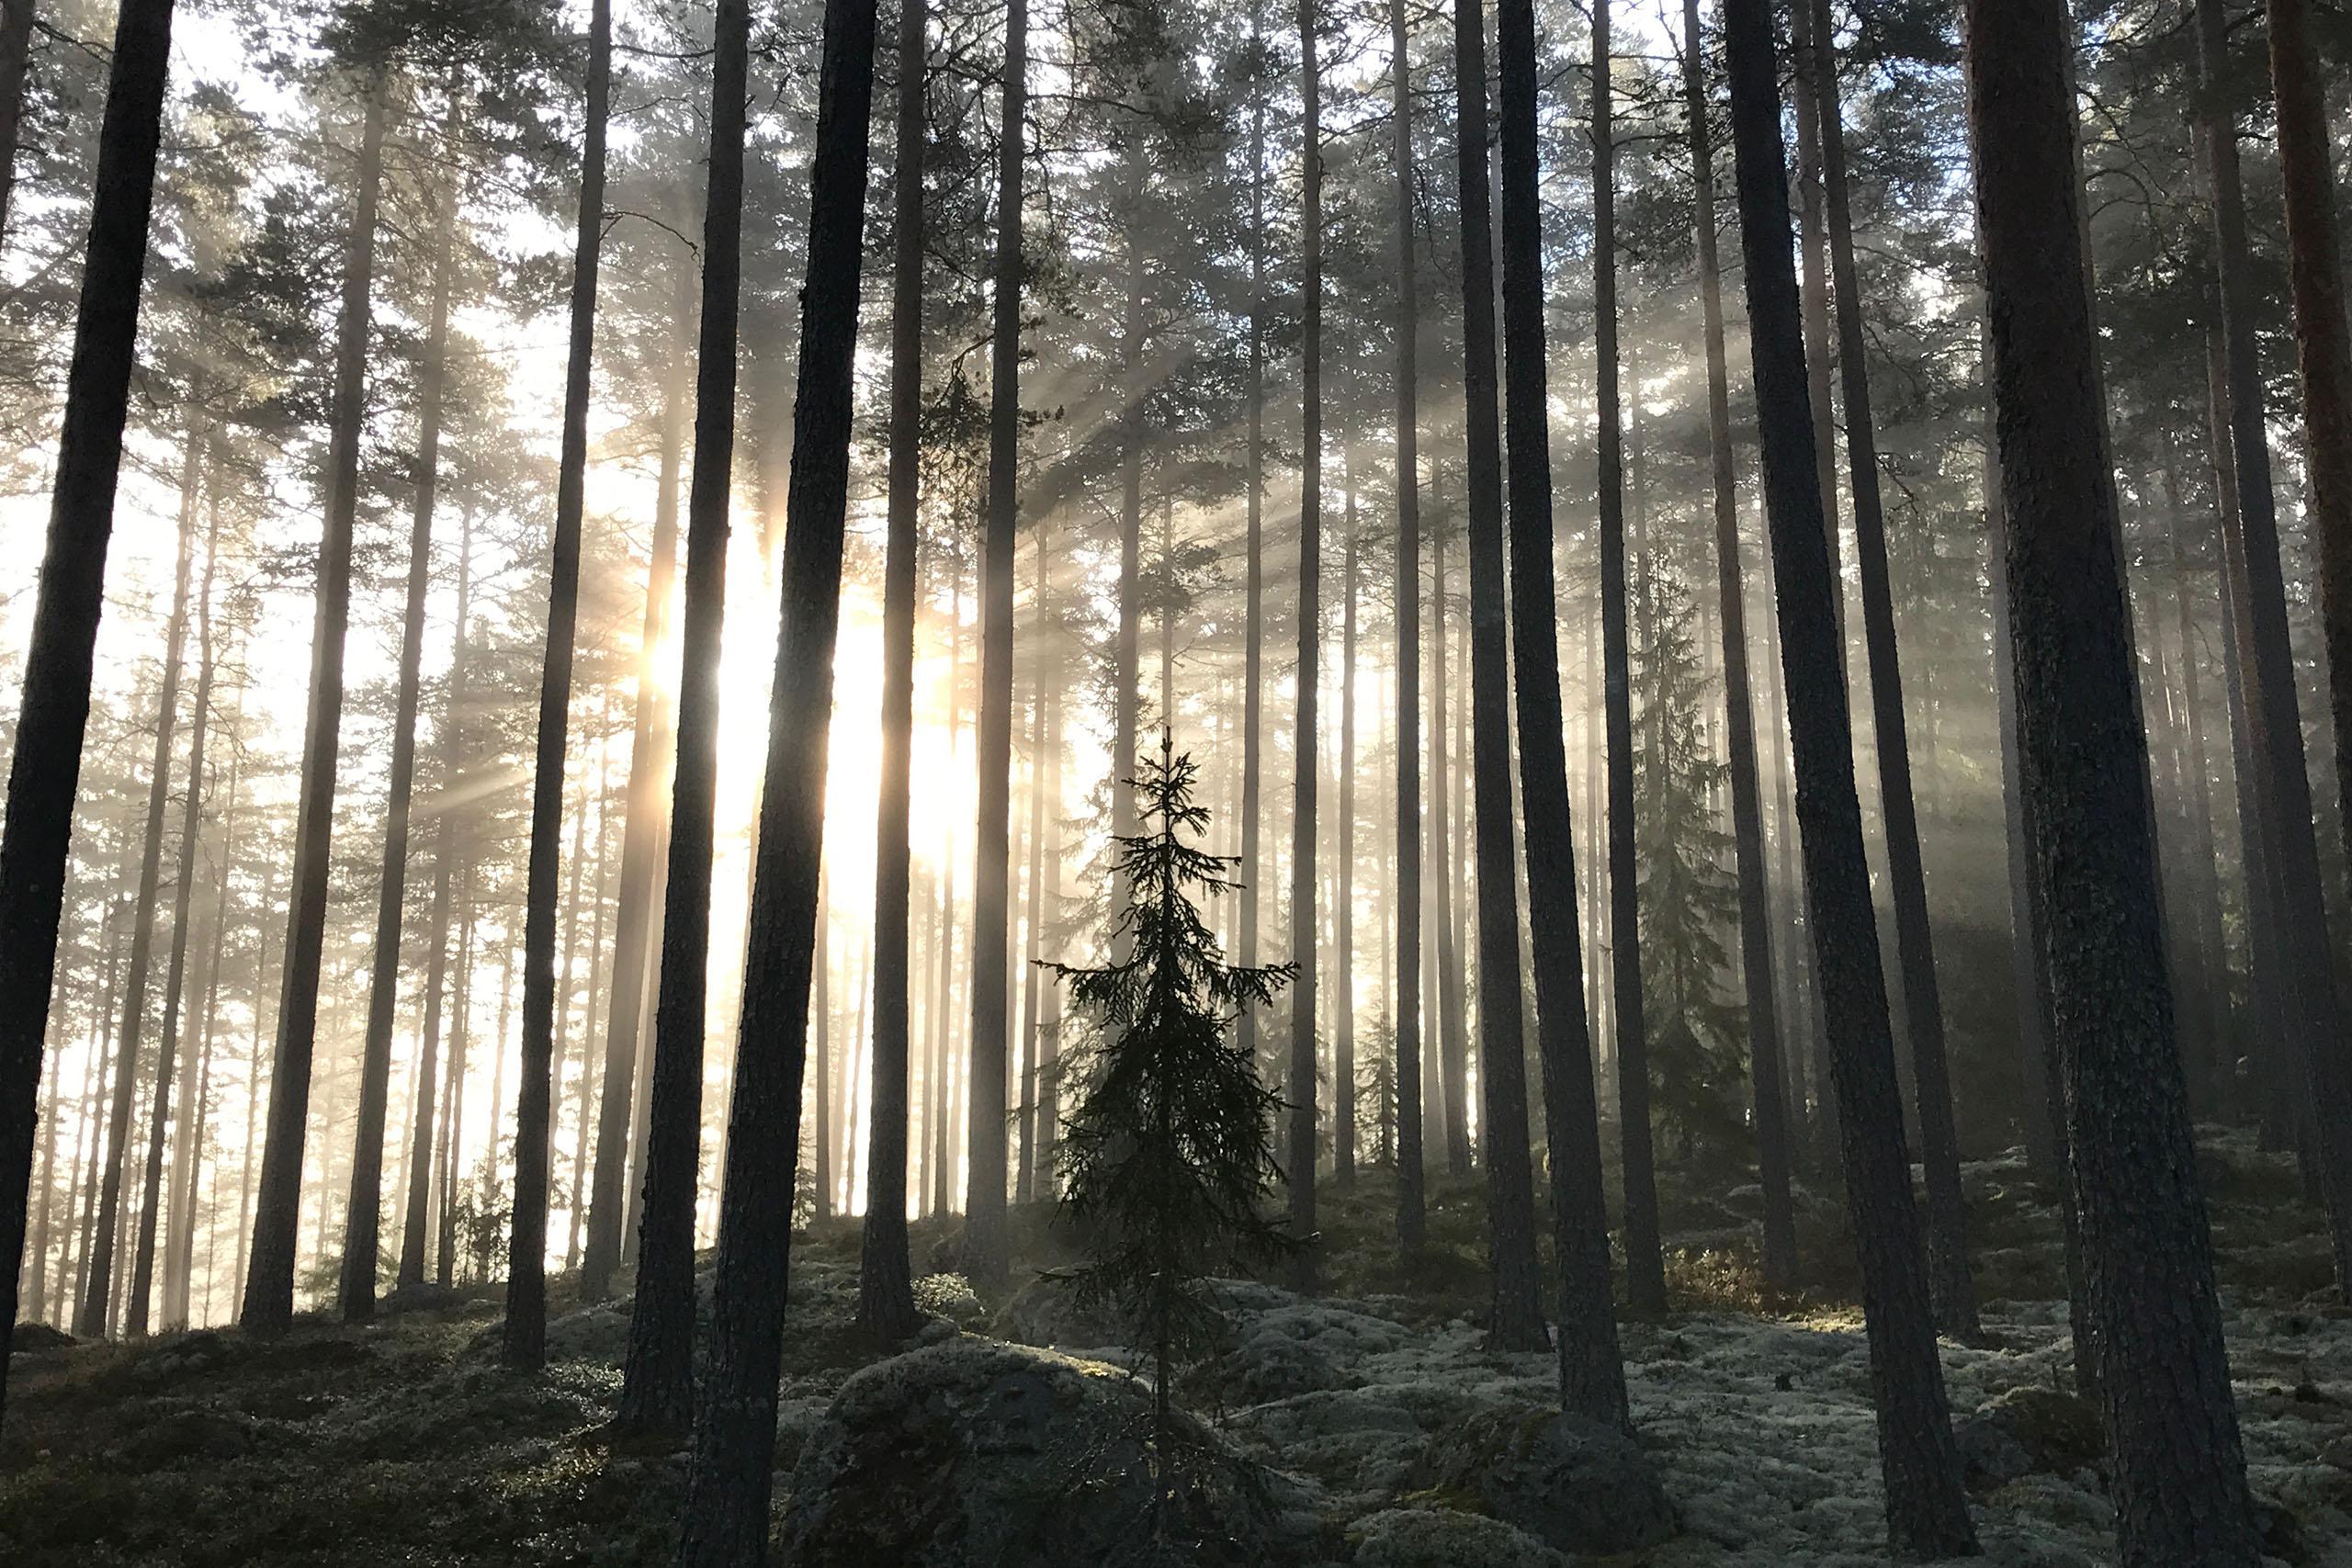 Sol_bland_träd_2560